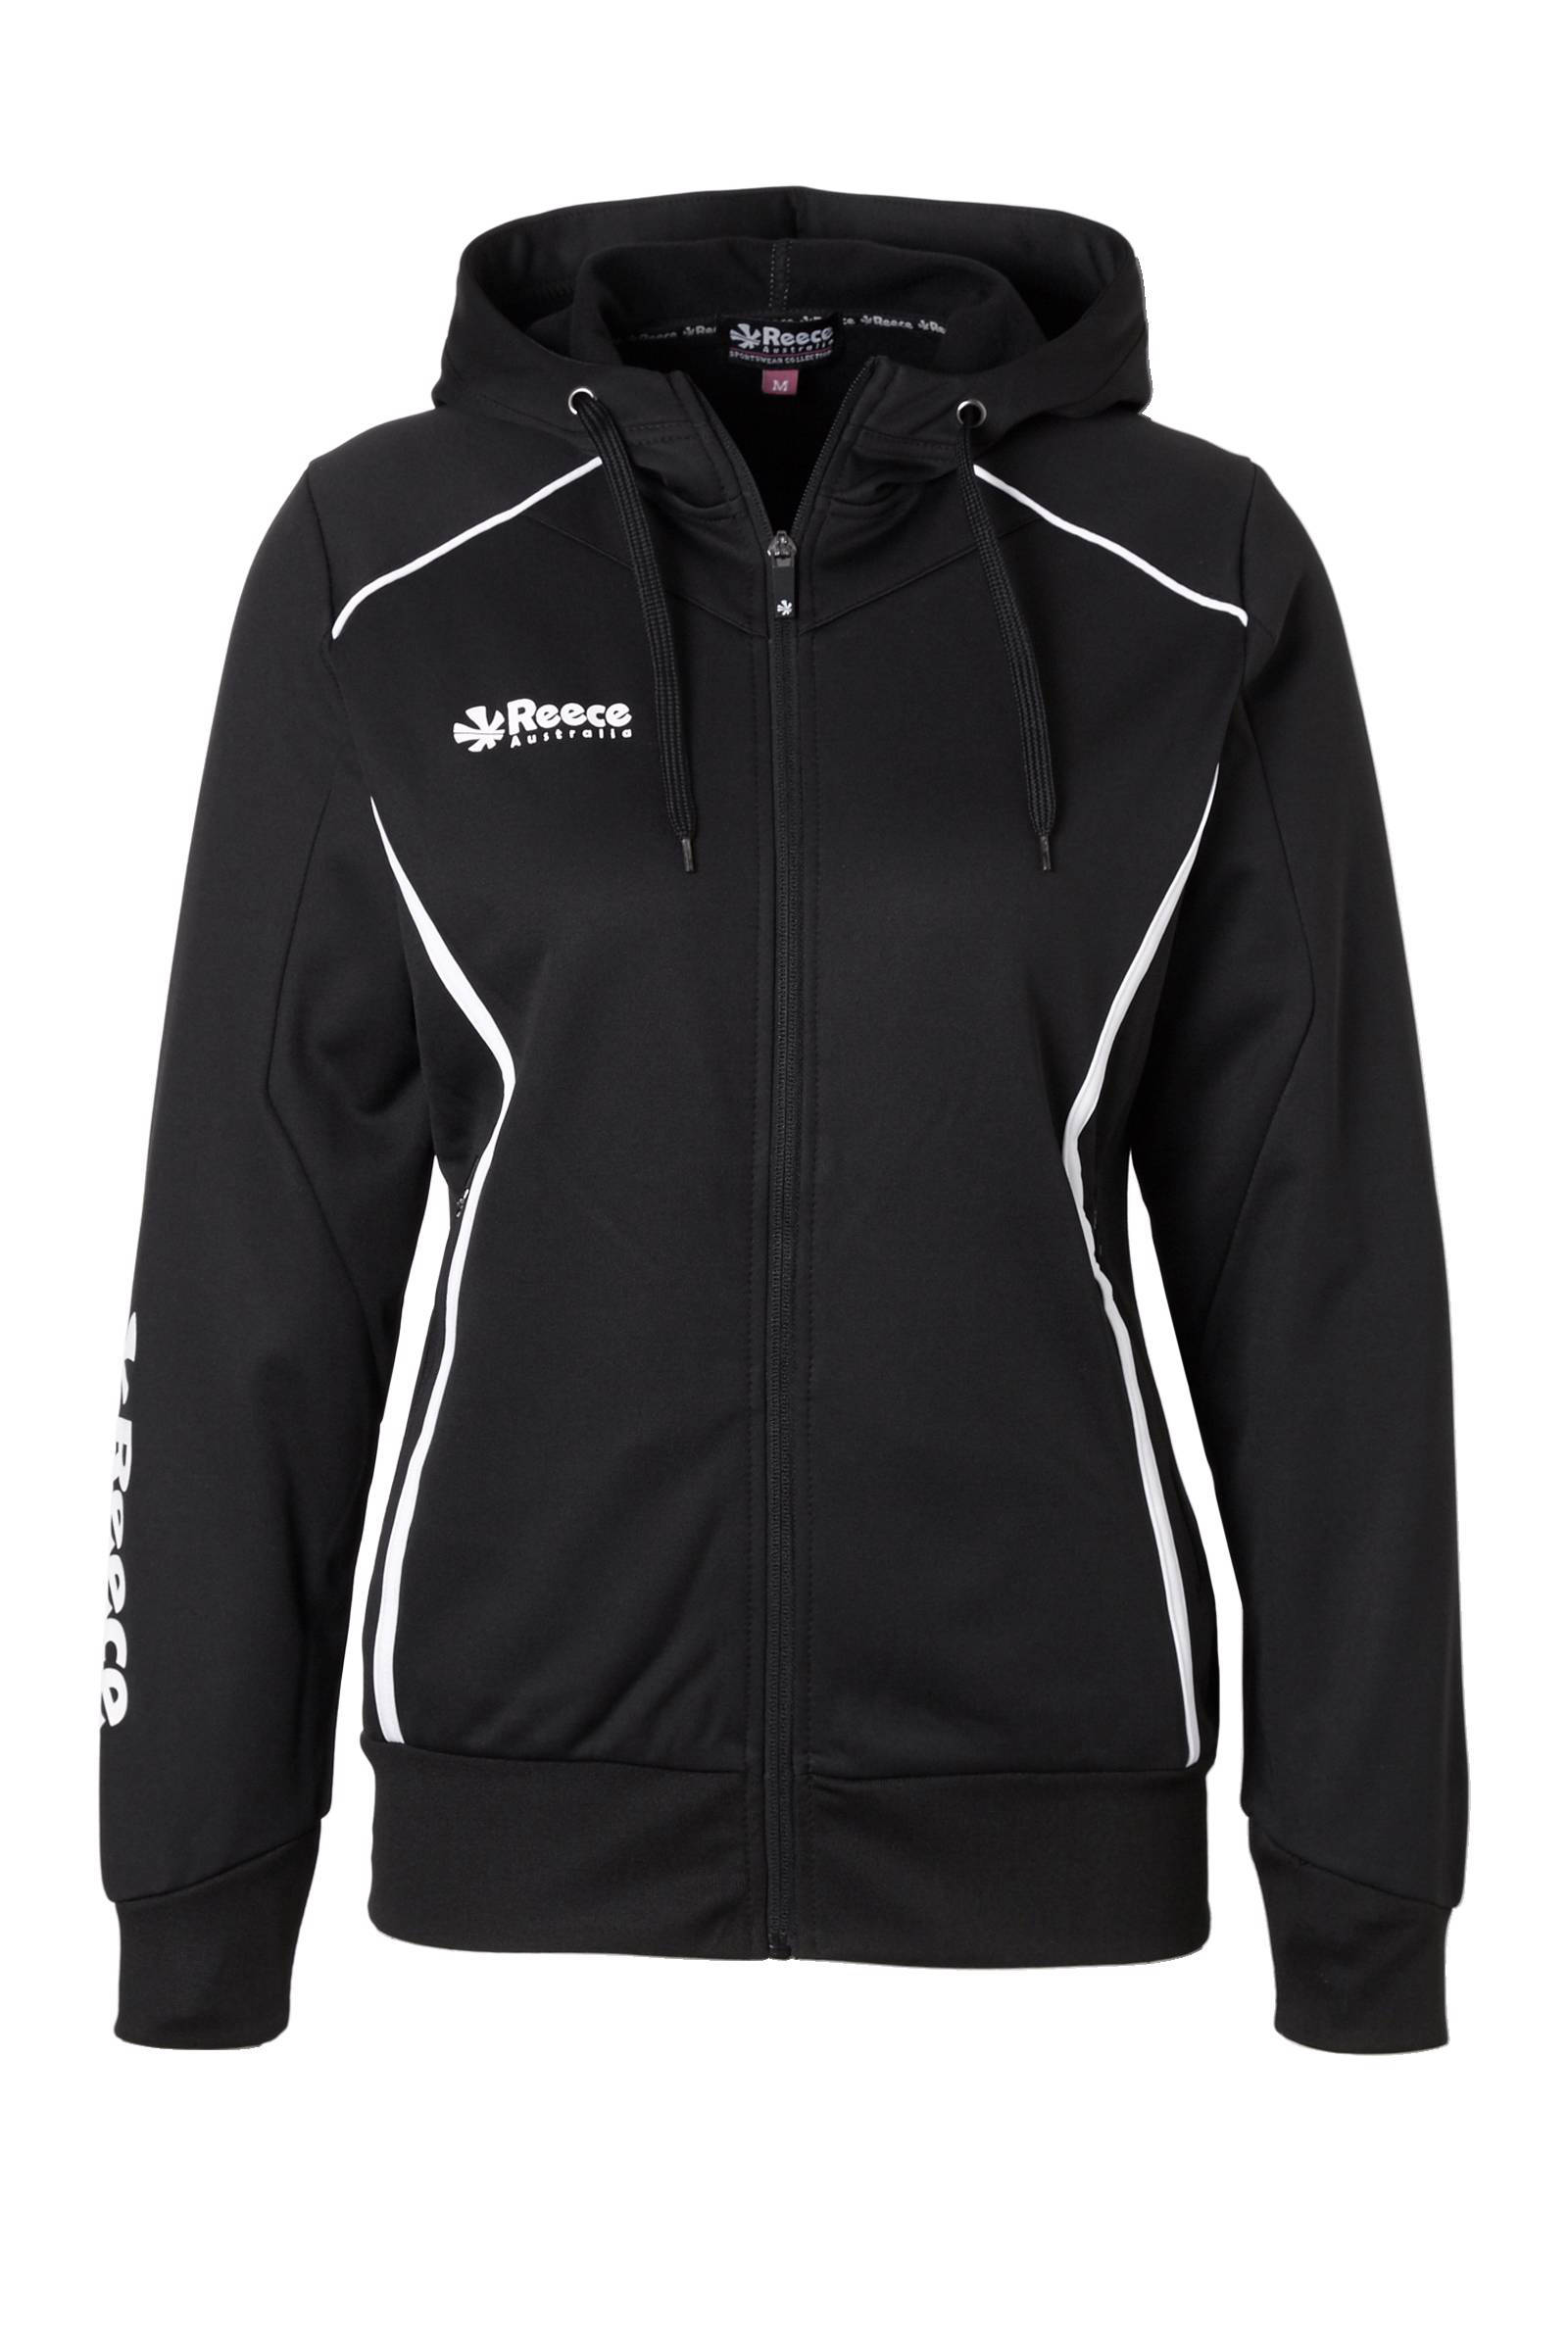 9beb1e2bee28e reece-australia-sportsweater-dames-zwart-8718726387047.jpg